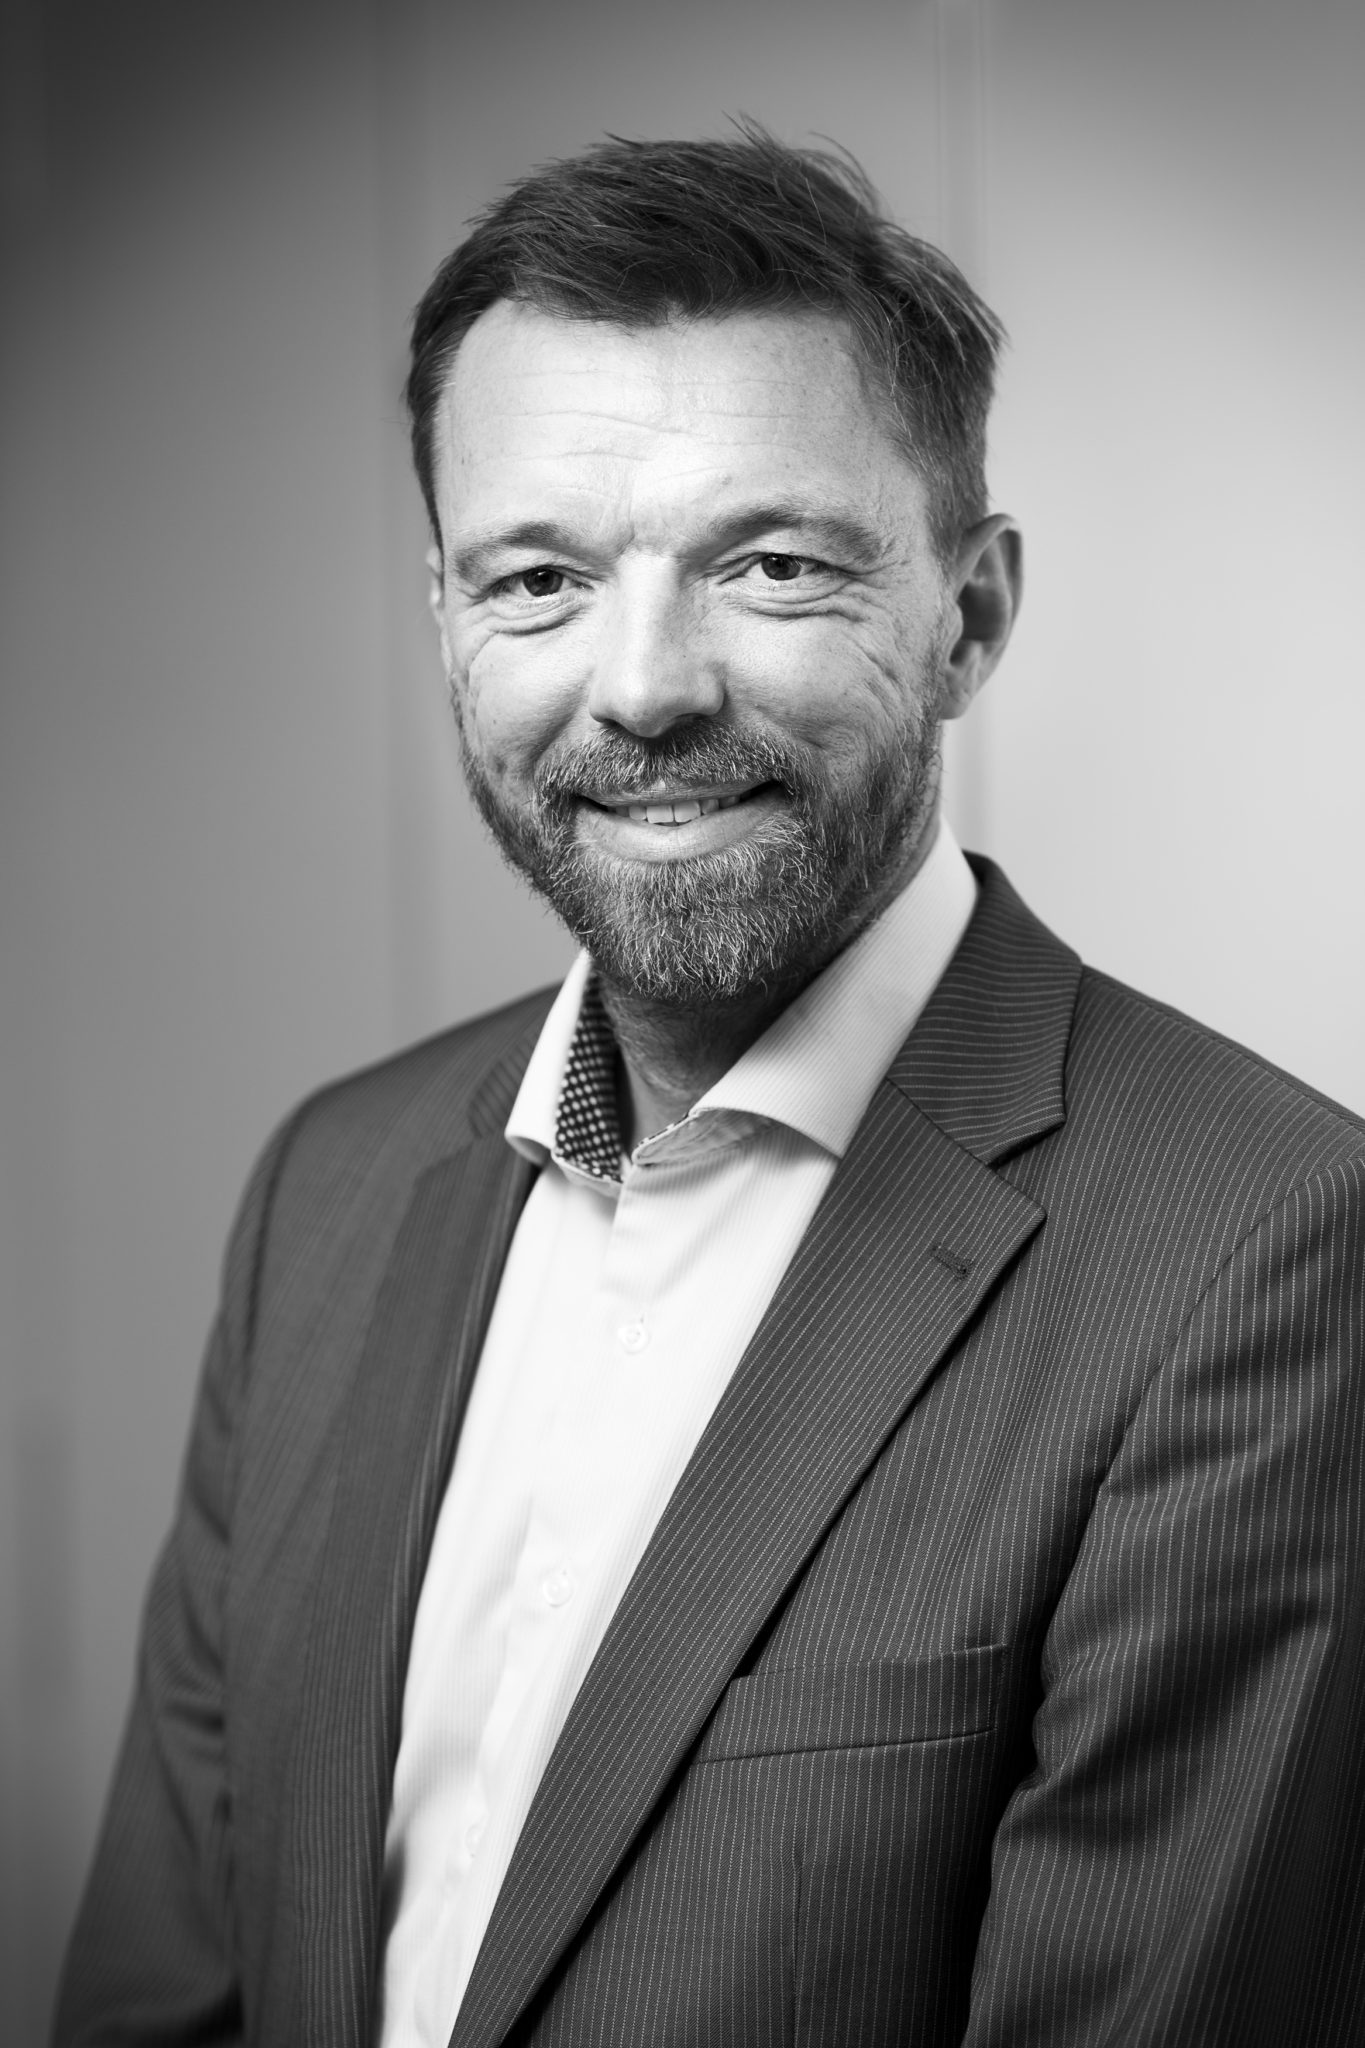 Rasmus Pedersen